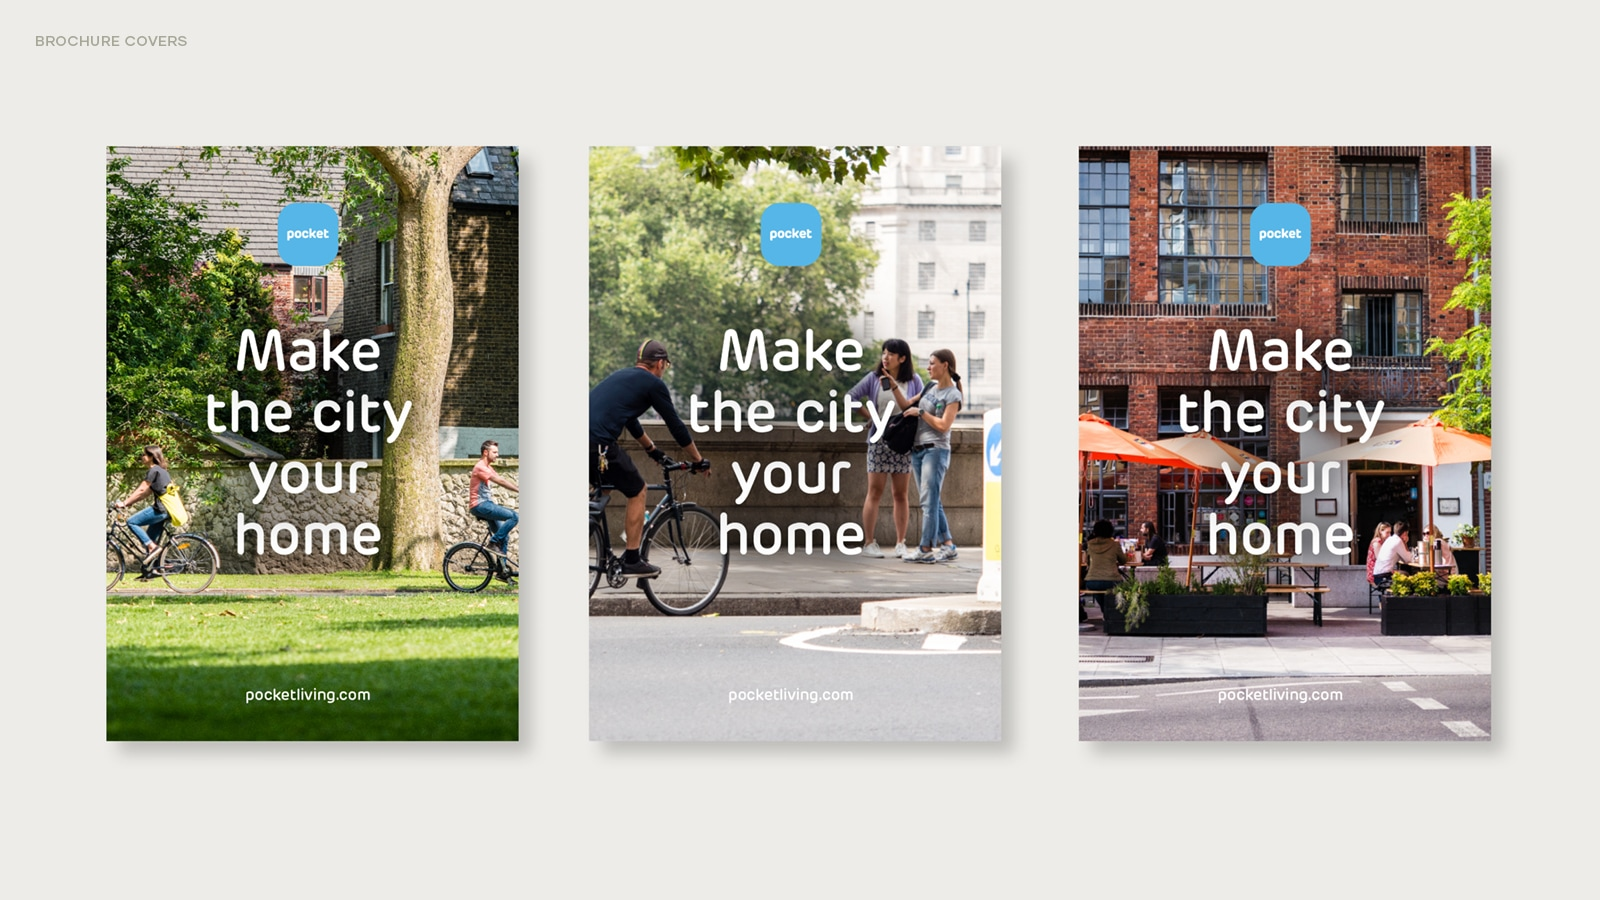 property-marketing-business-communications-branding-graphic-design-milton-keynes-london52